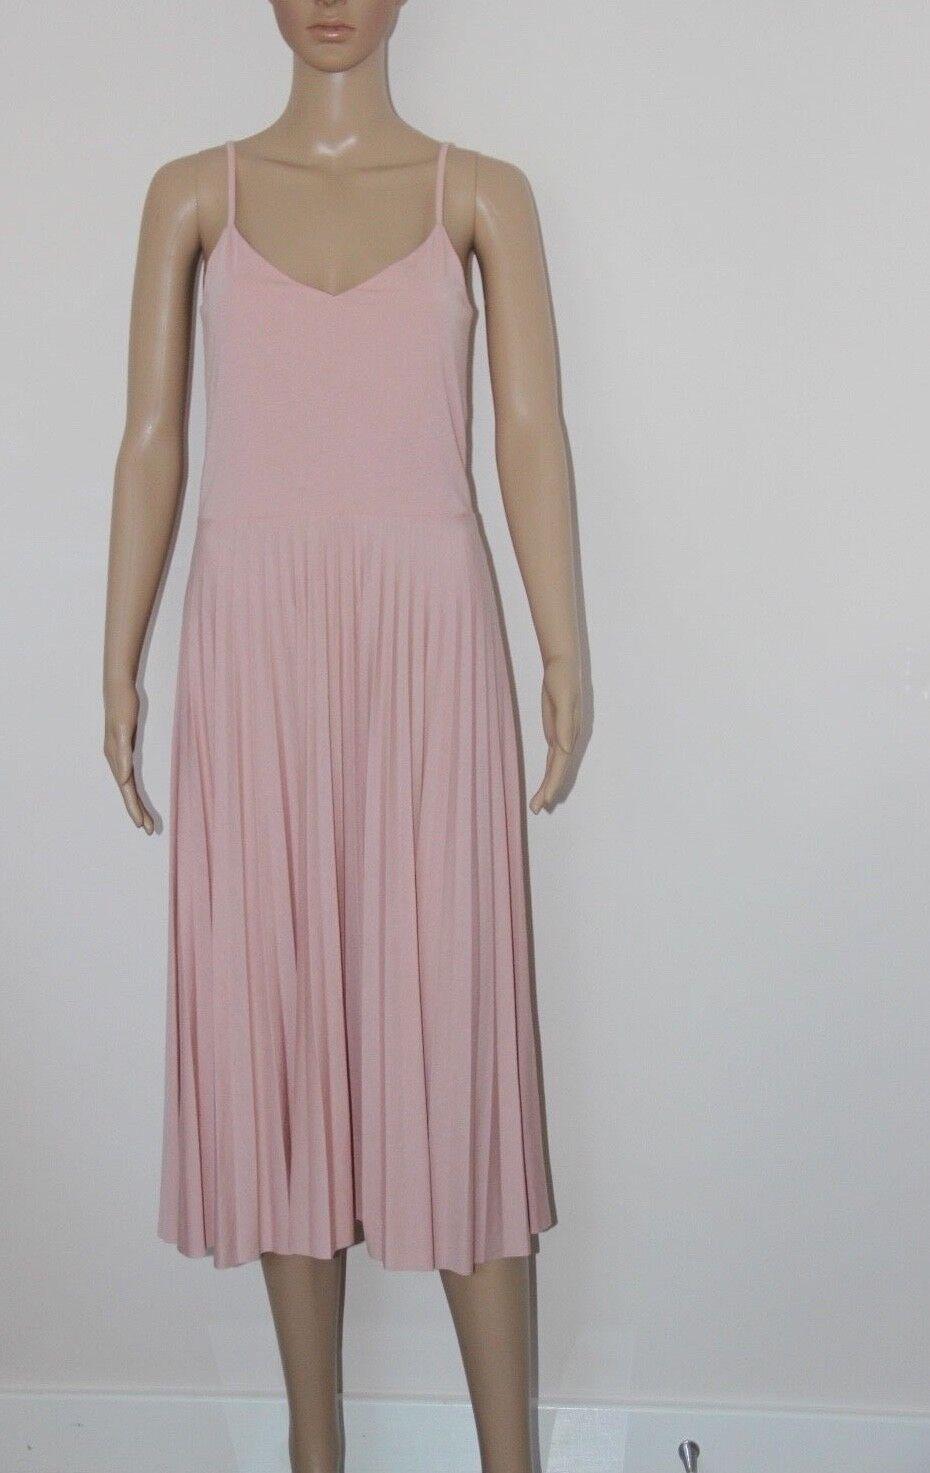 ASOS Ladies Pleated Cami Dress in Pink UK12 EU40 US8